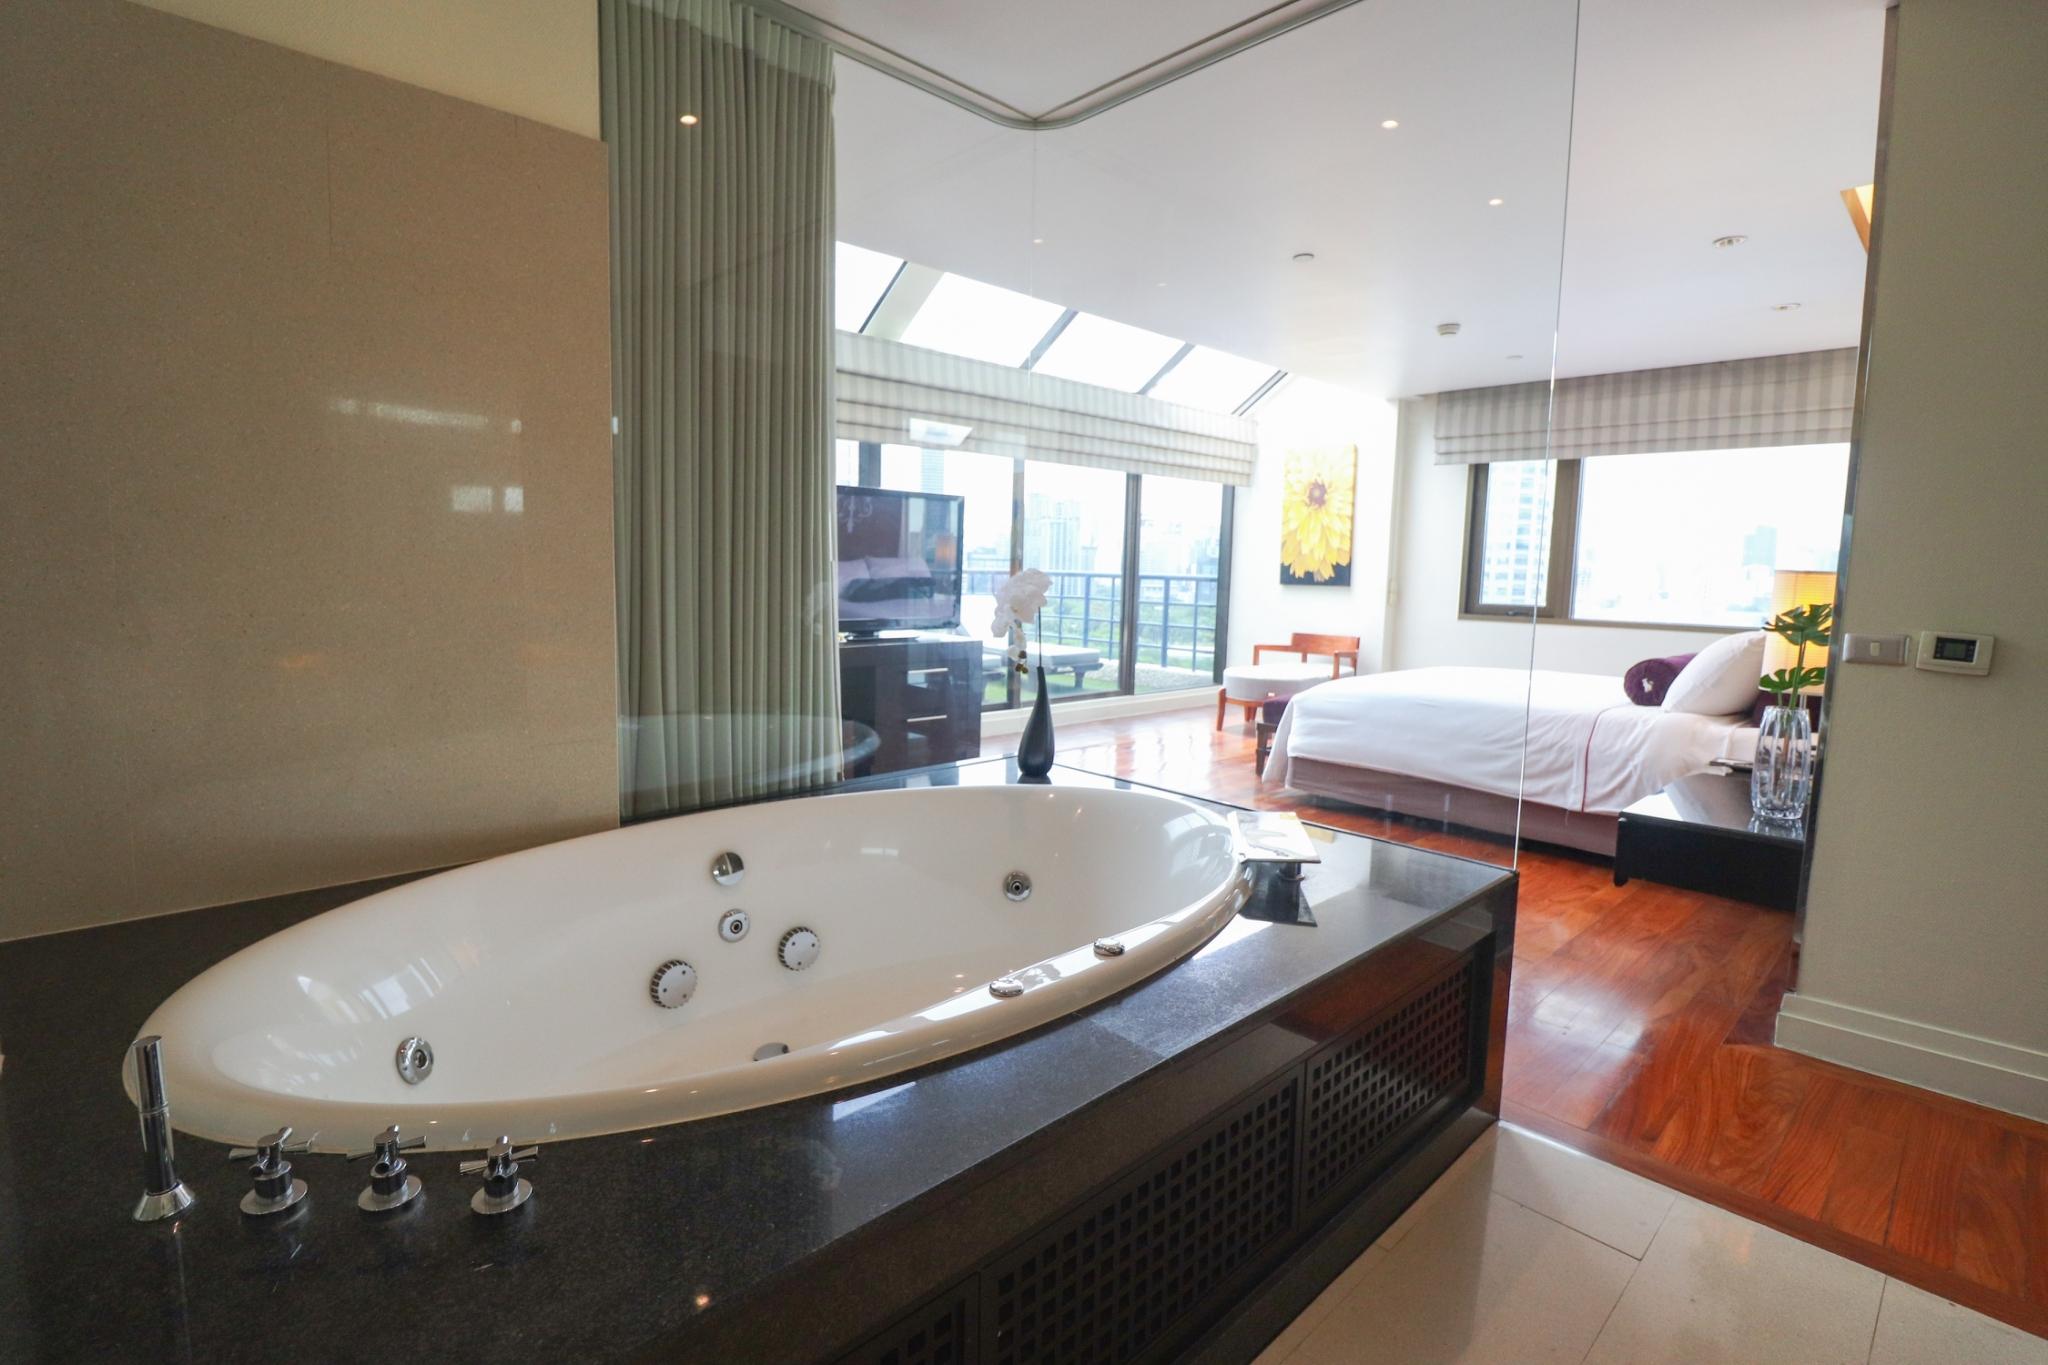 Bangkok Condo For Rent in Sathorn Sala Deang Silom Stunning Condo w/Jacuzzi